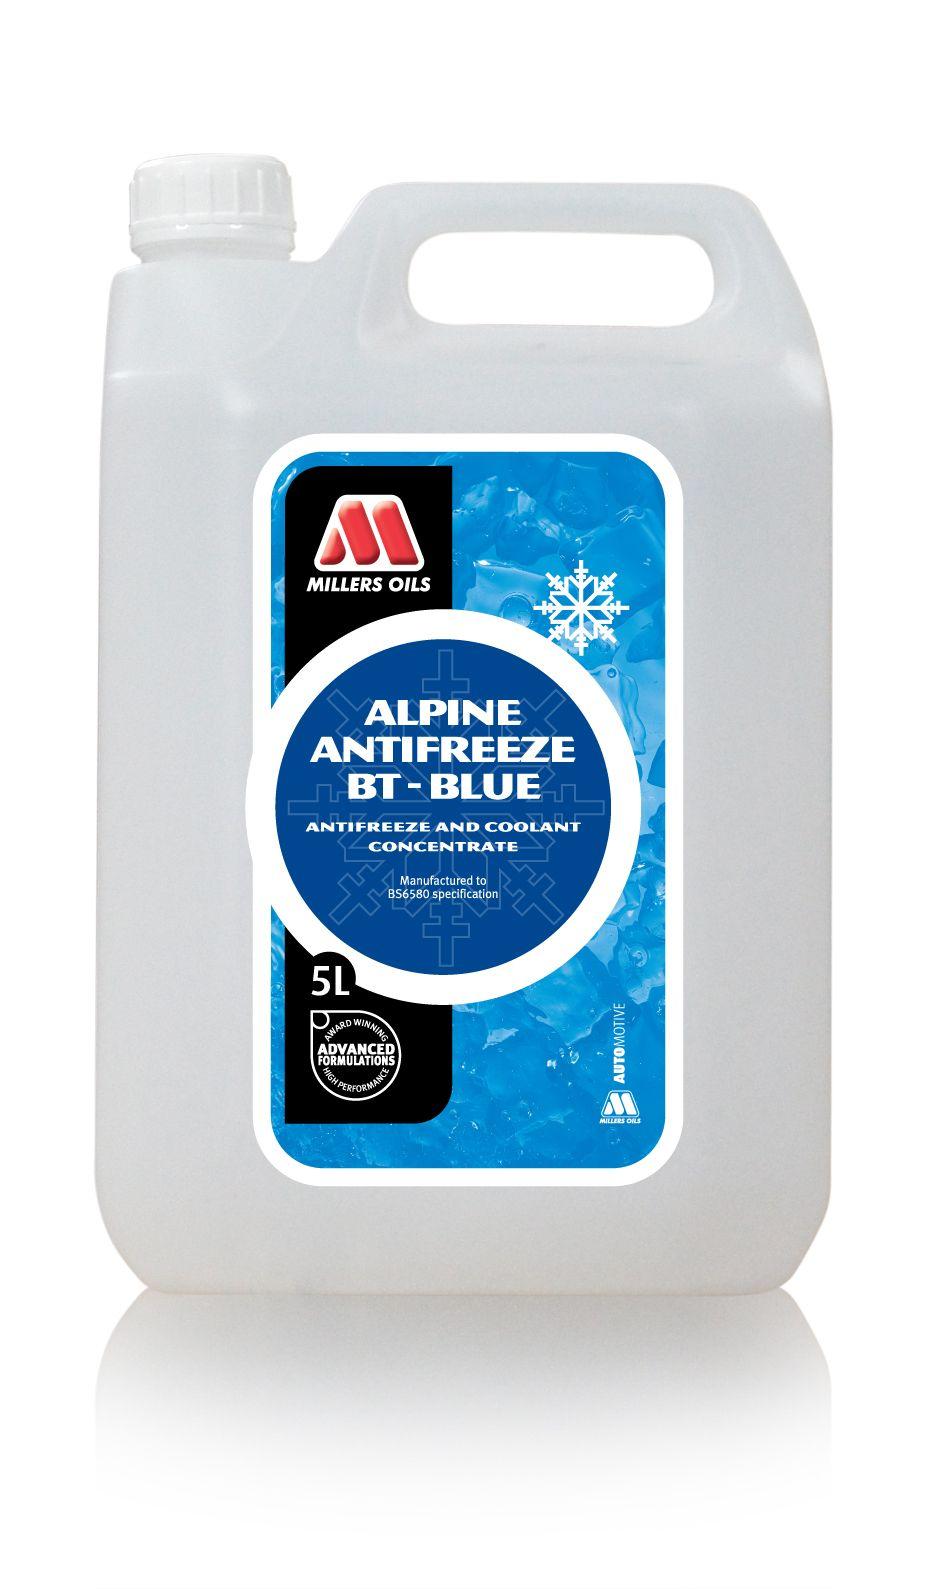 Alpine Antifreeze BT-Blue 2 year - 5 litres